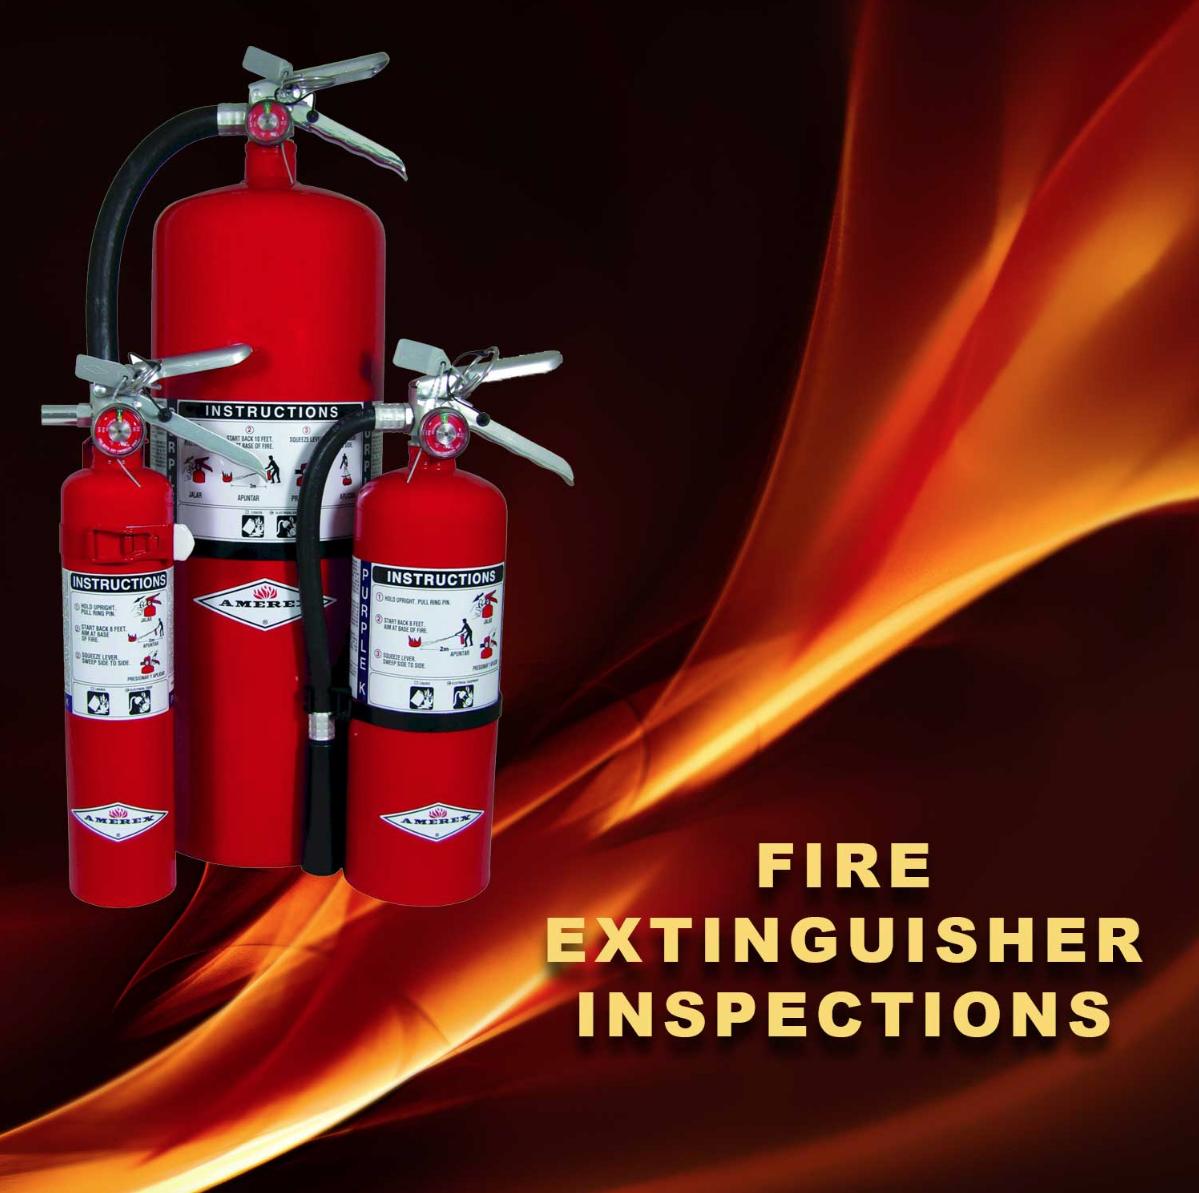 Fire Extinguisher Inspections Feuerloscher